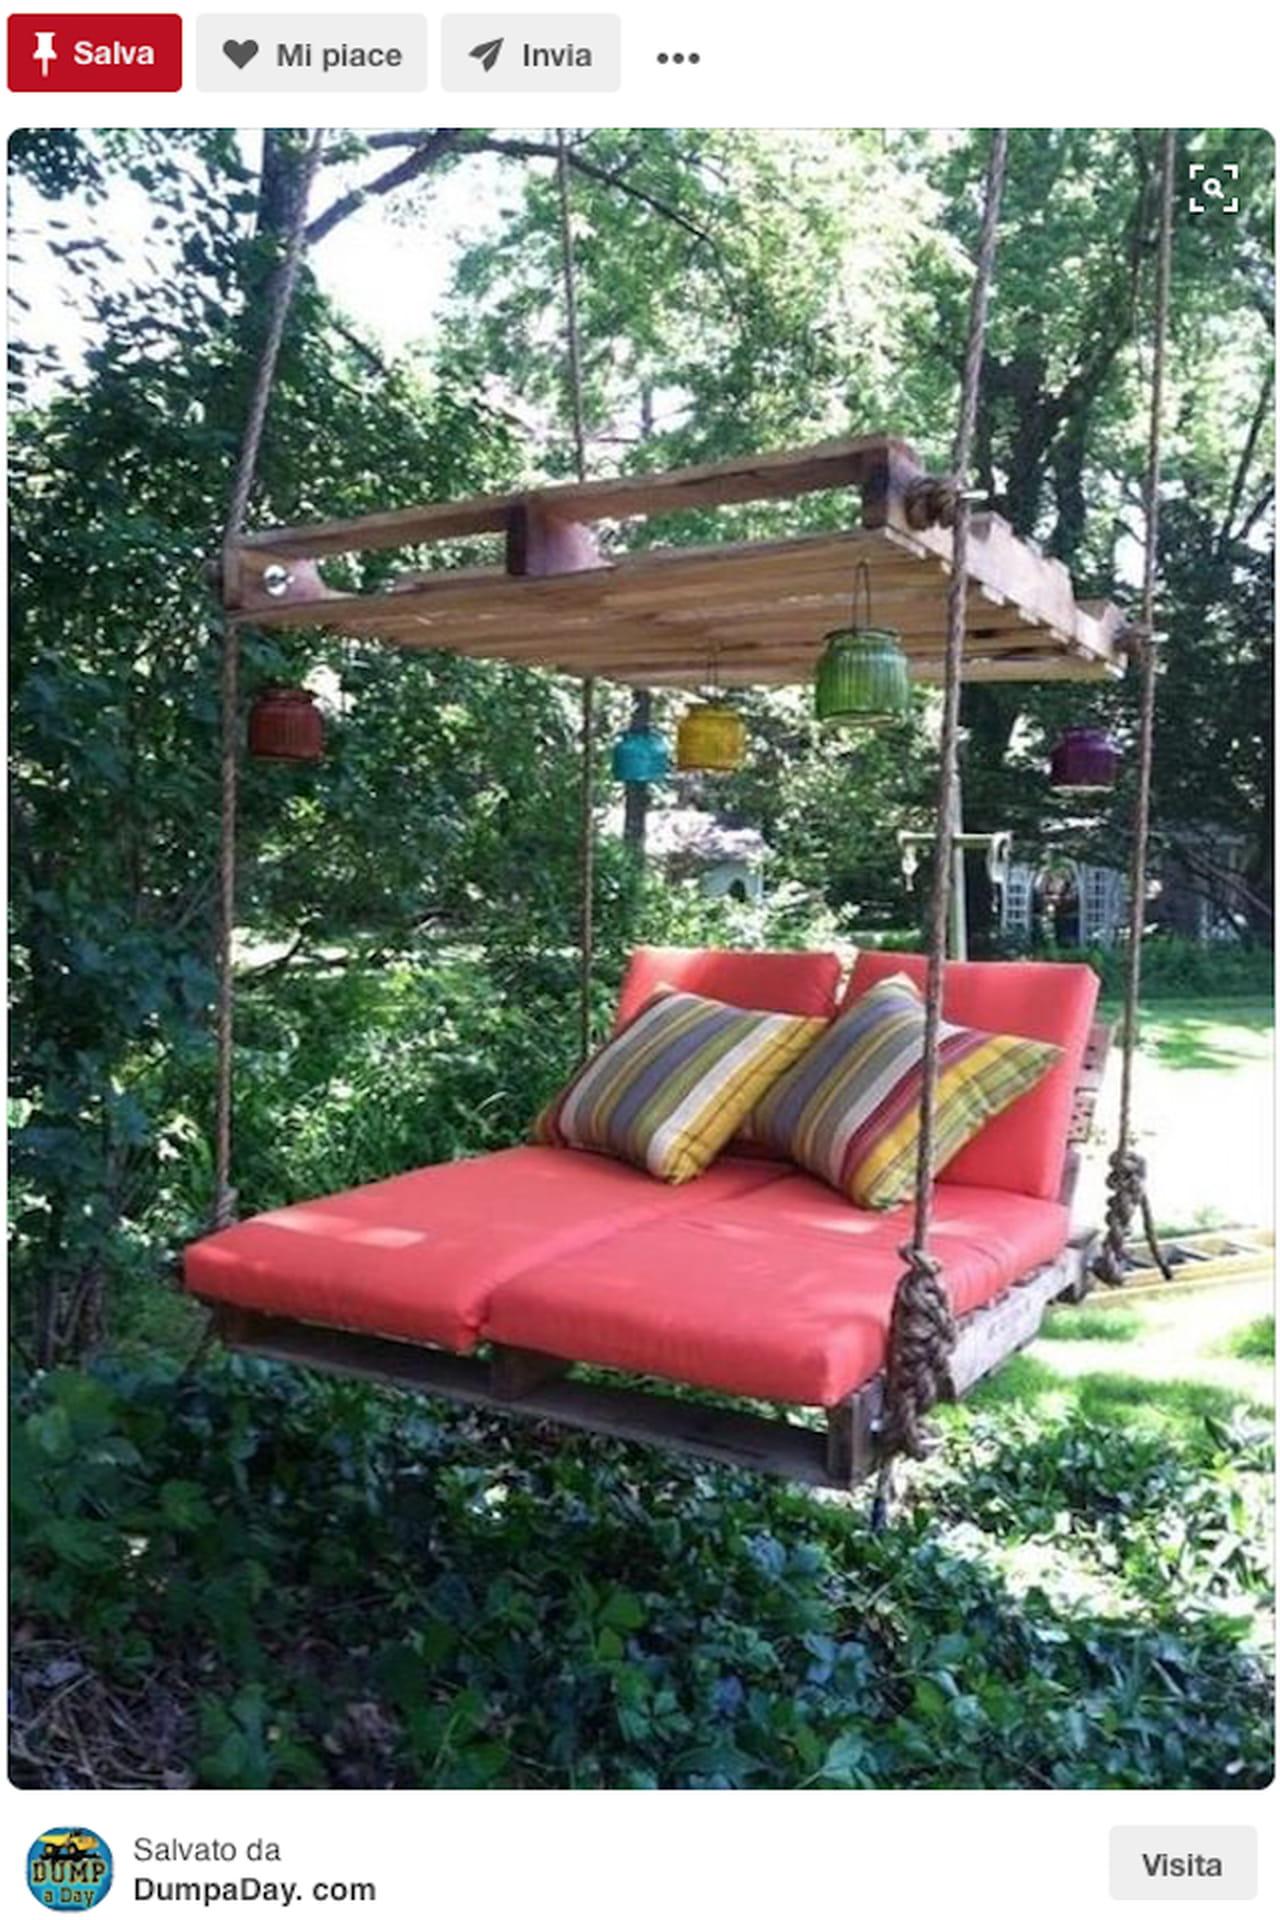 Creazioni fai da te idee giardino da pinterest - Idee giardino casa ...